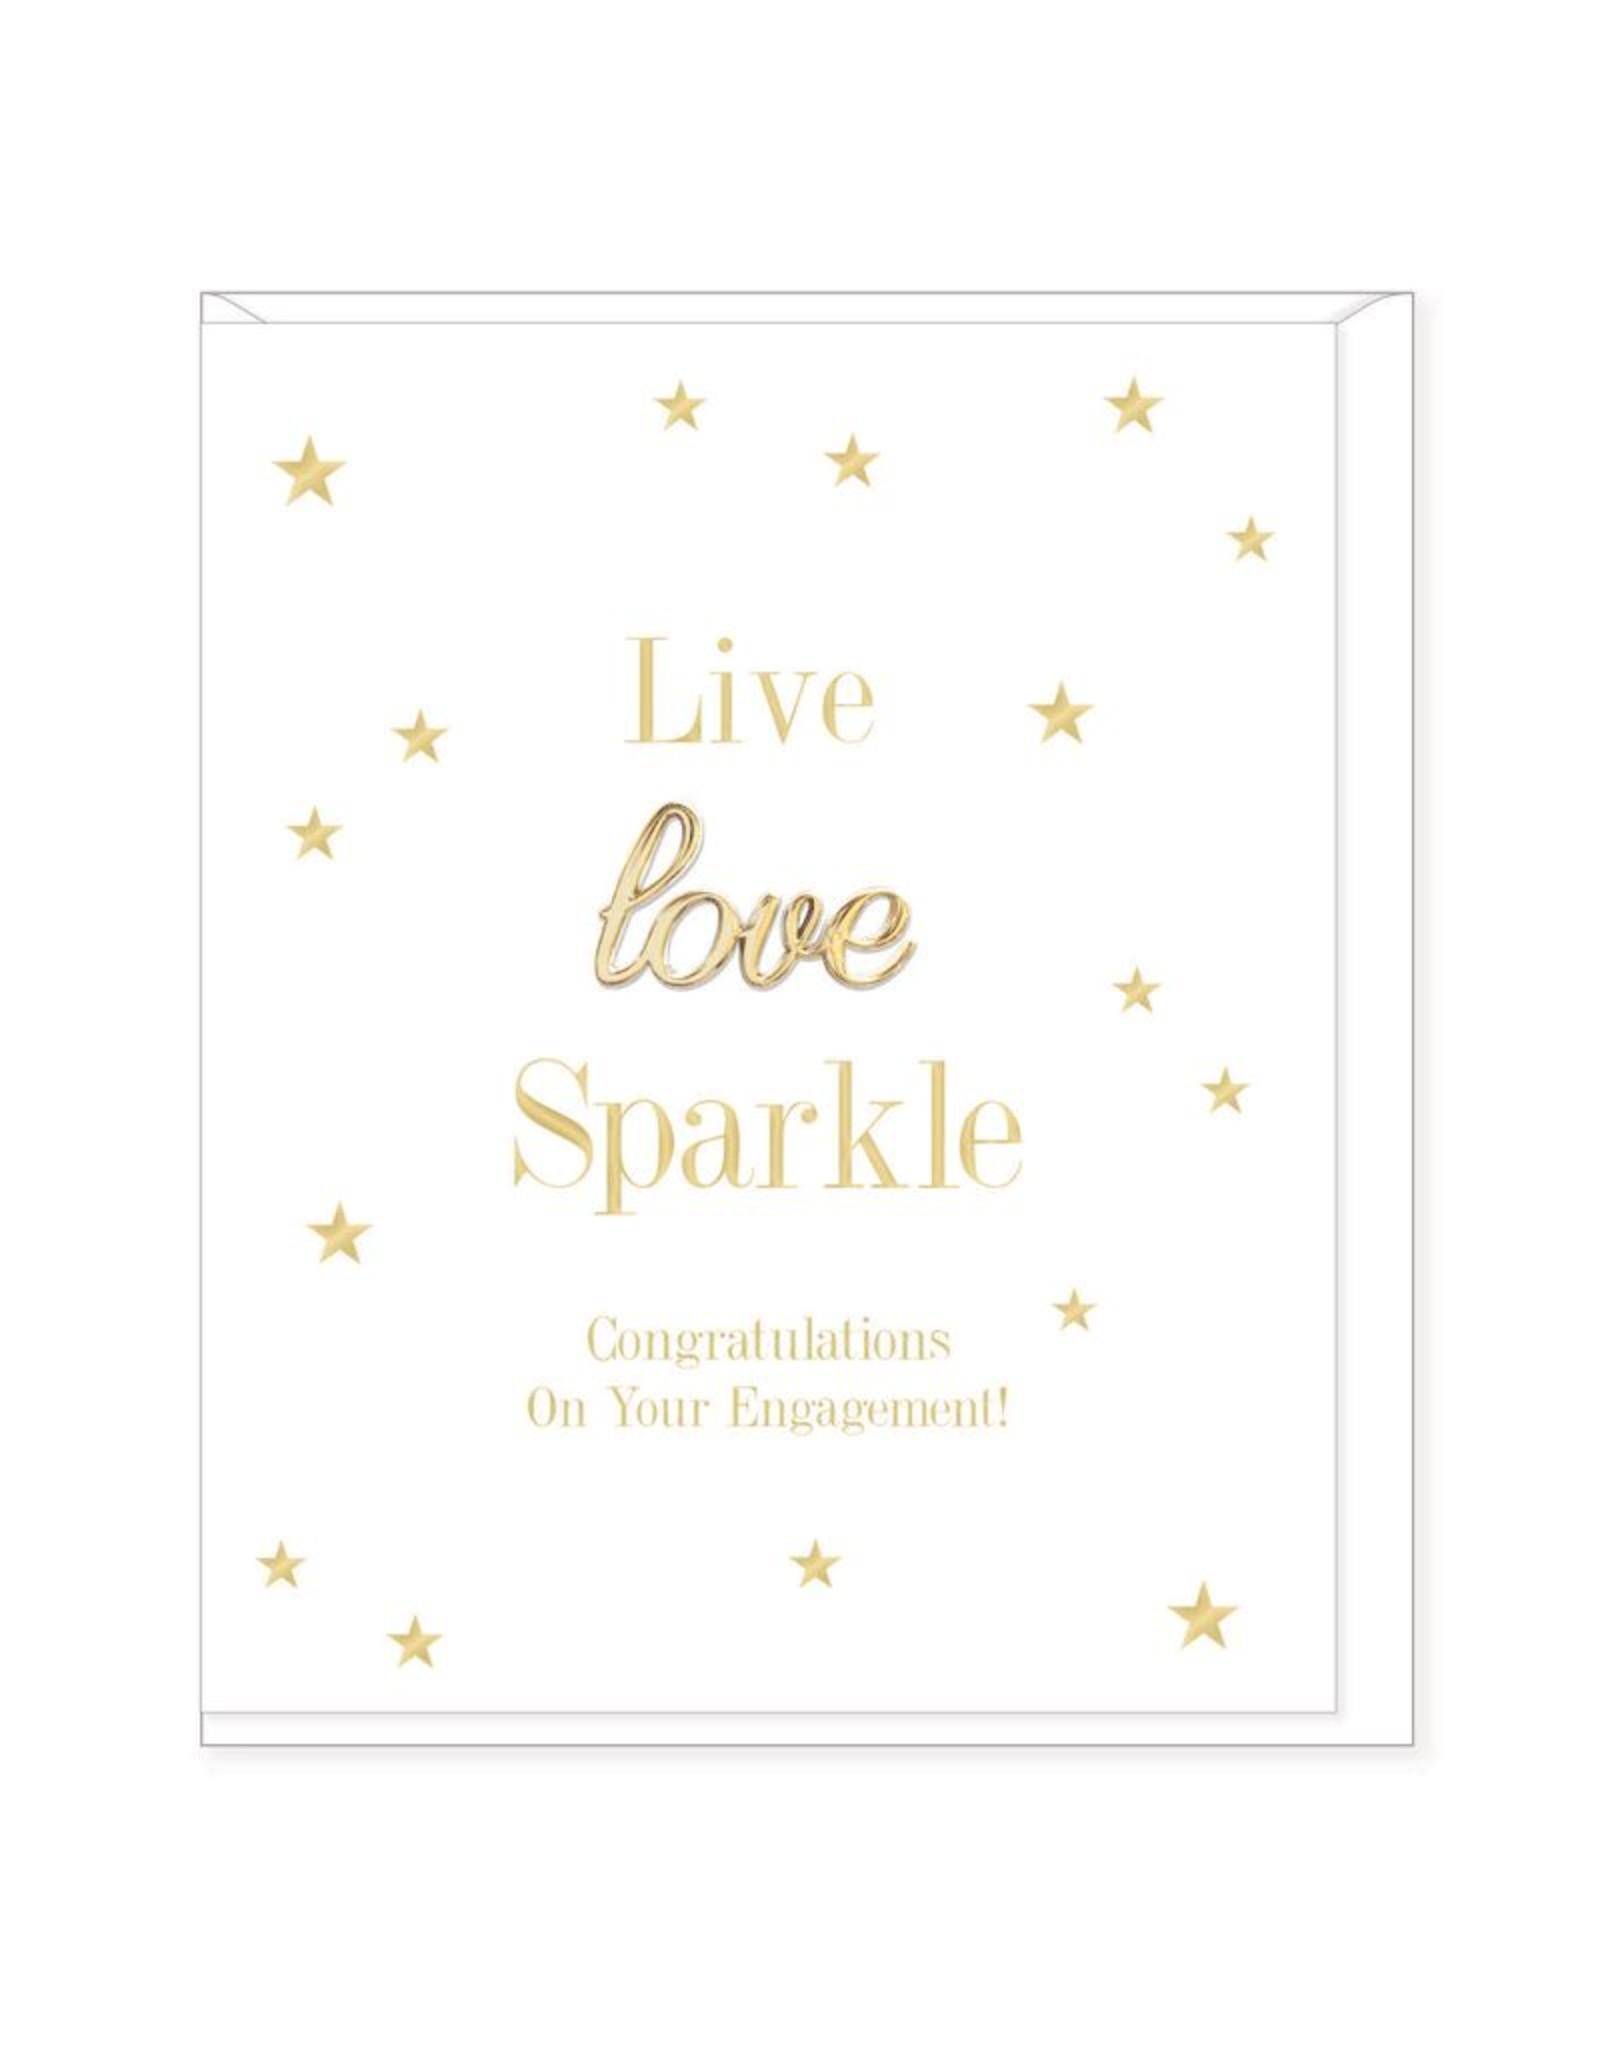 Hearts Design Wenskaart - Live, Love, Sparkle - Engagement